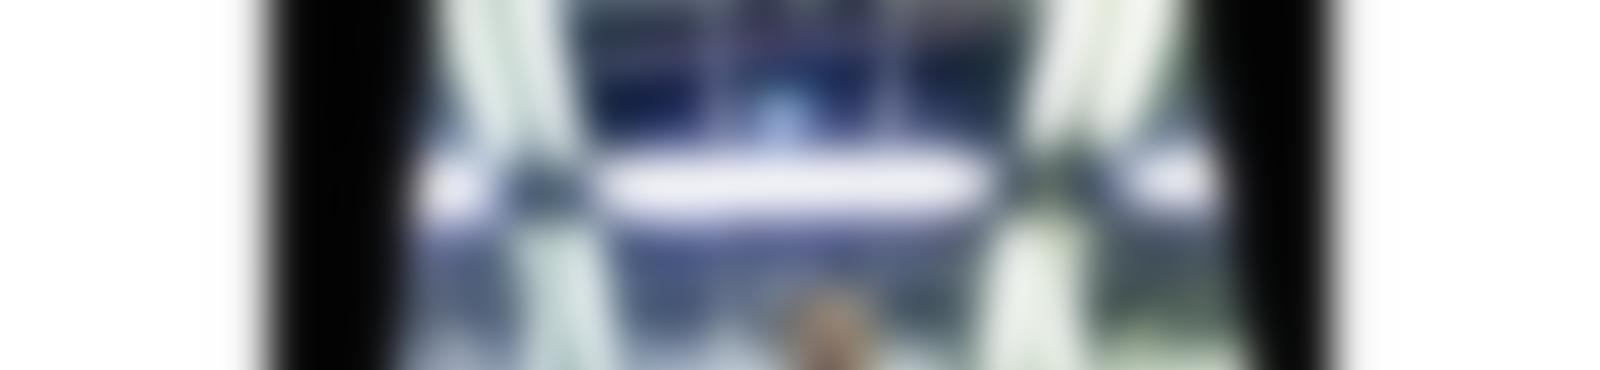 Blurred 4ff36598 ccbd 4b20 b935 3c2da79ad4ac